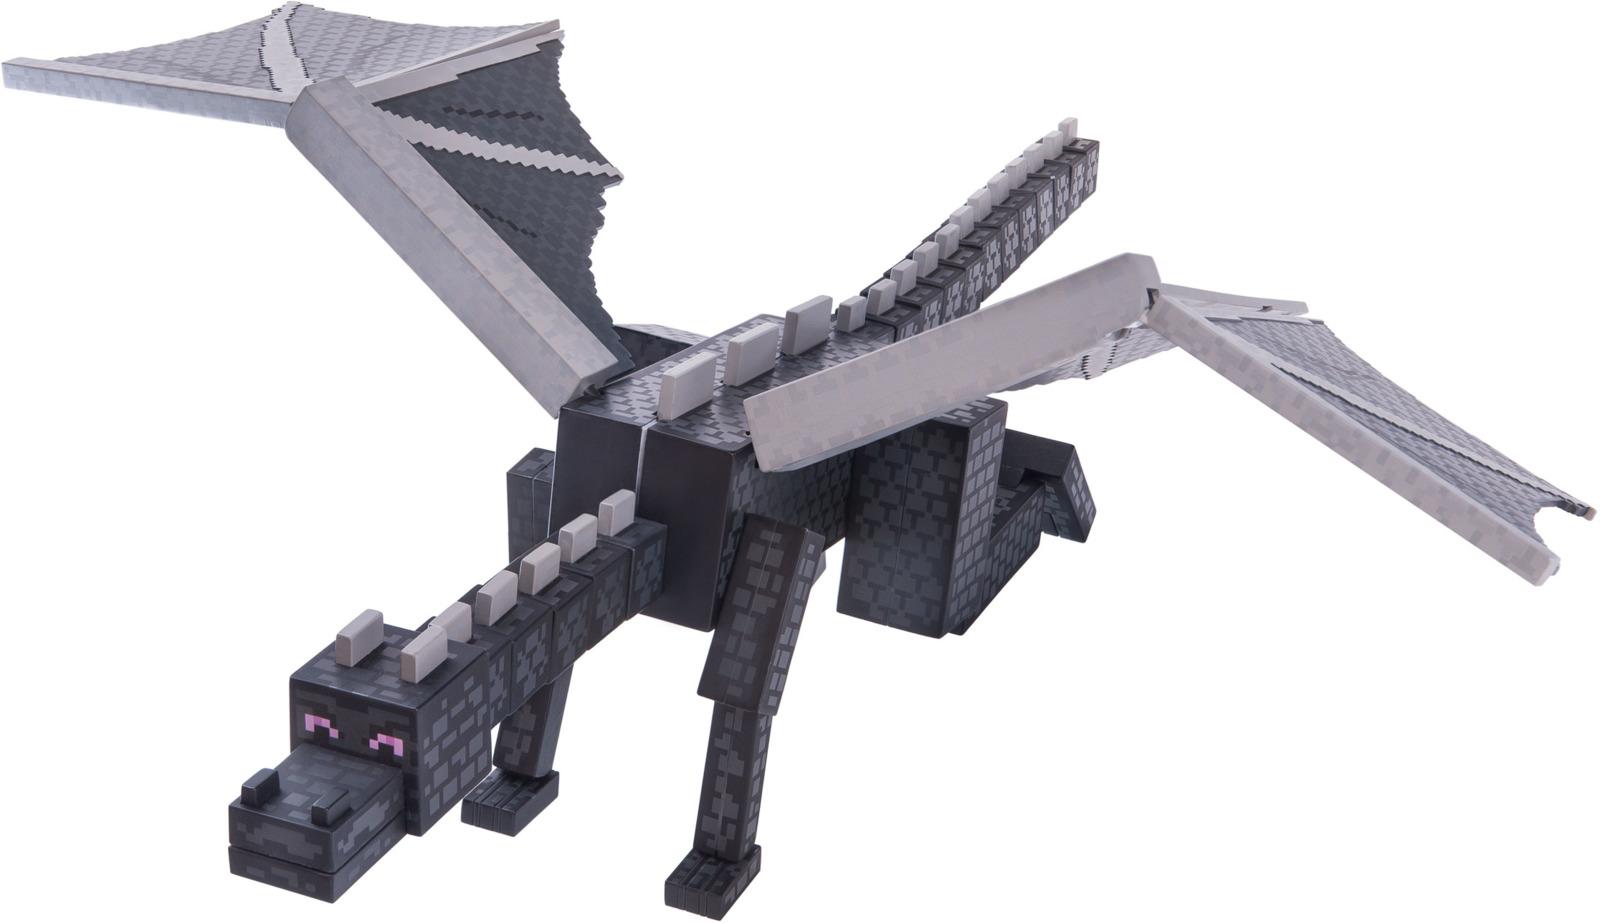 Фигурка Minecraft Ender Dragon, размах крыльев 52 см все цены